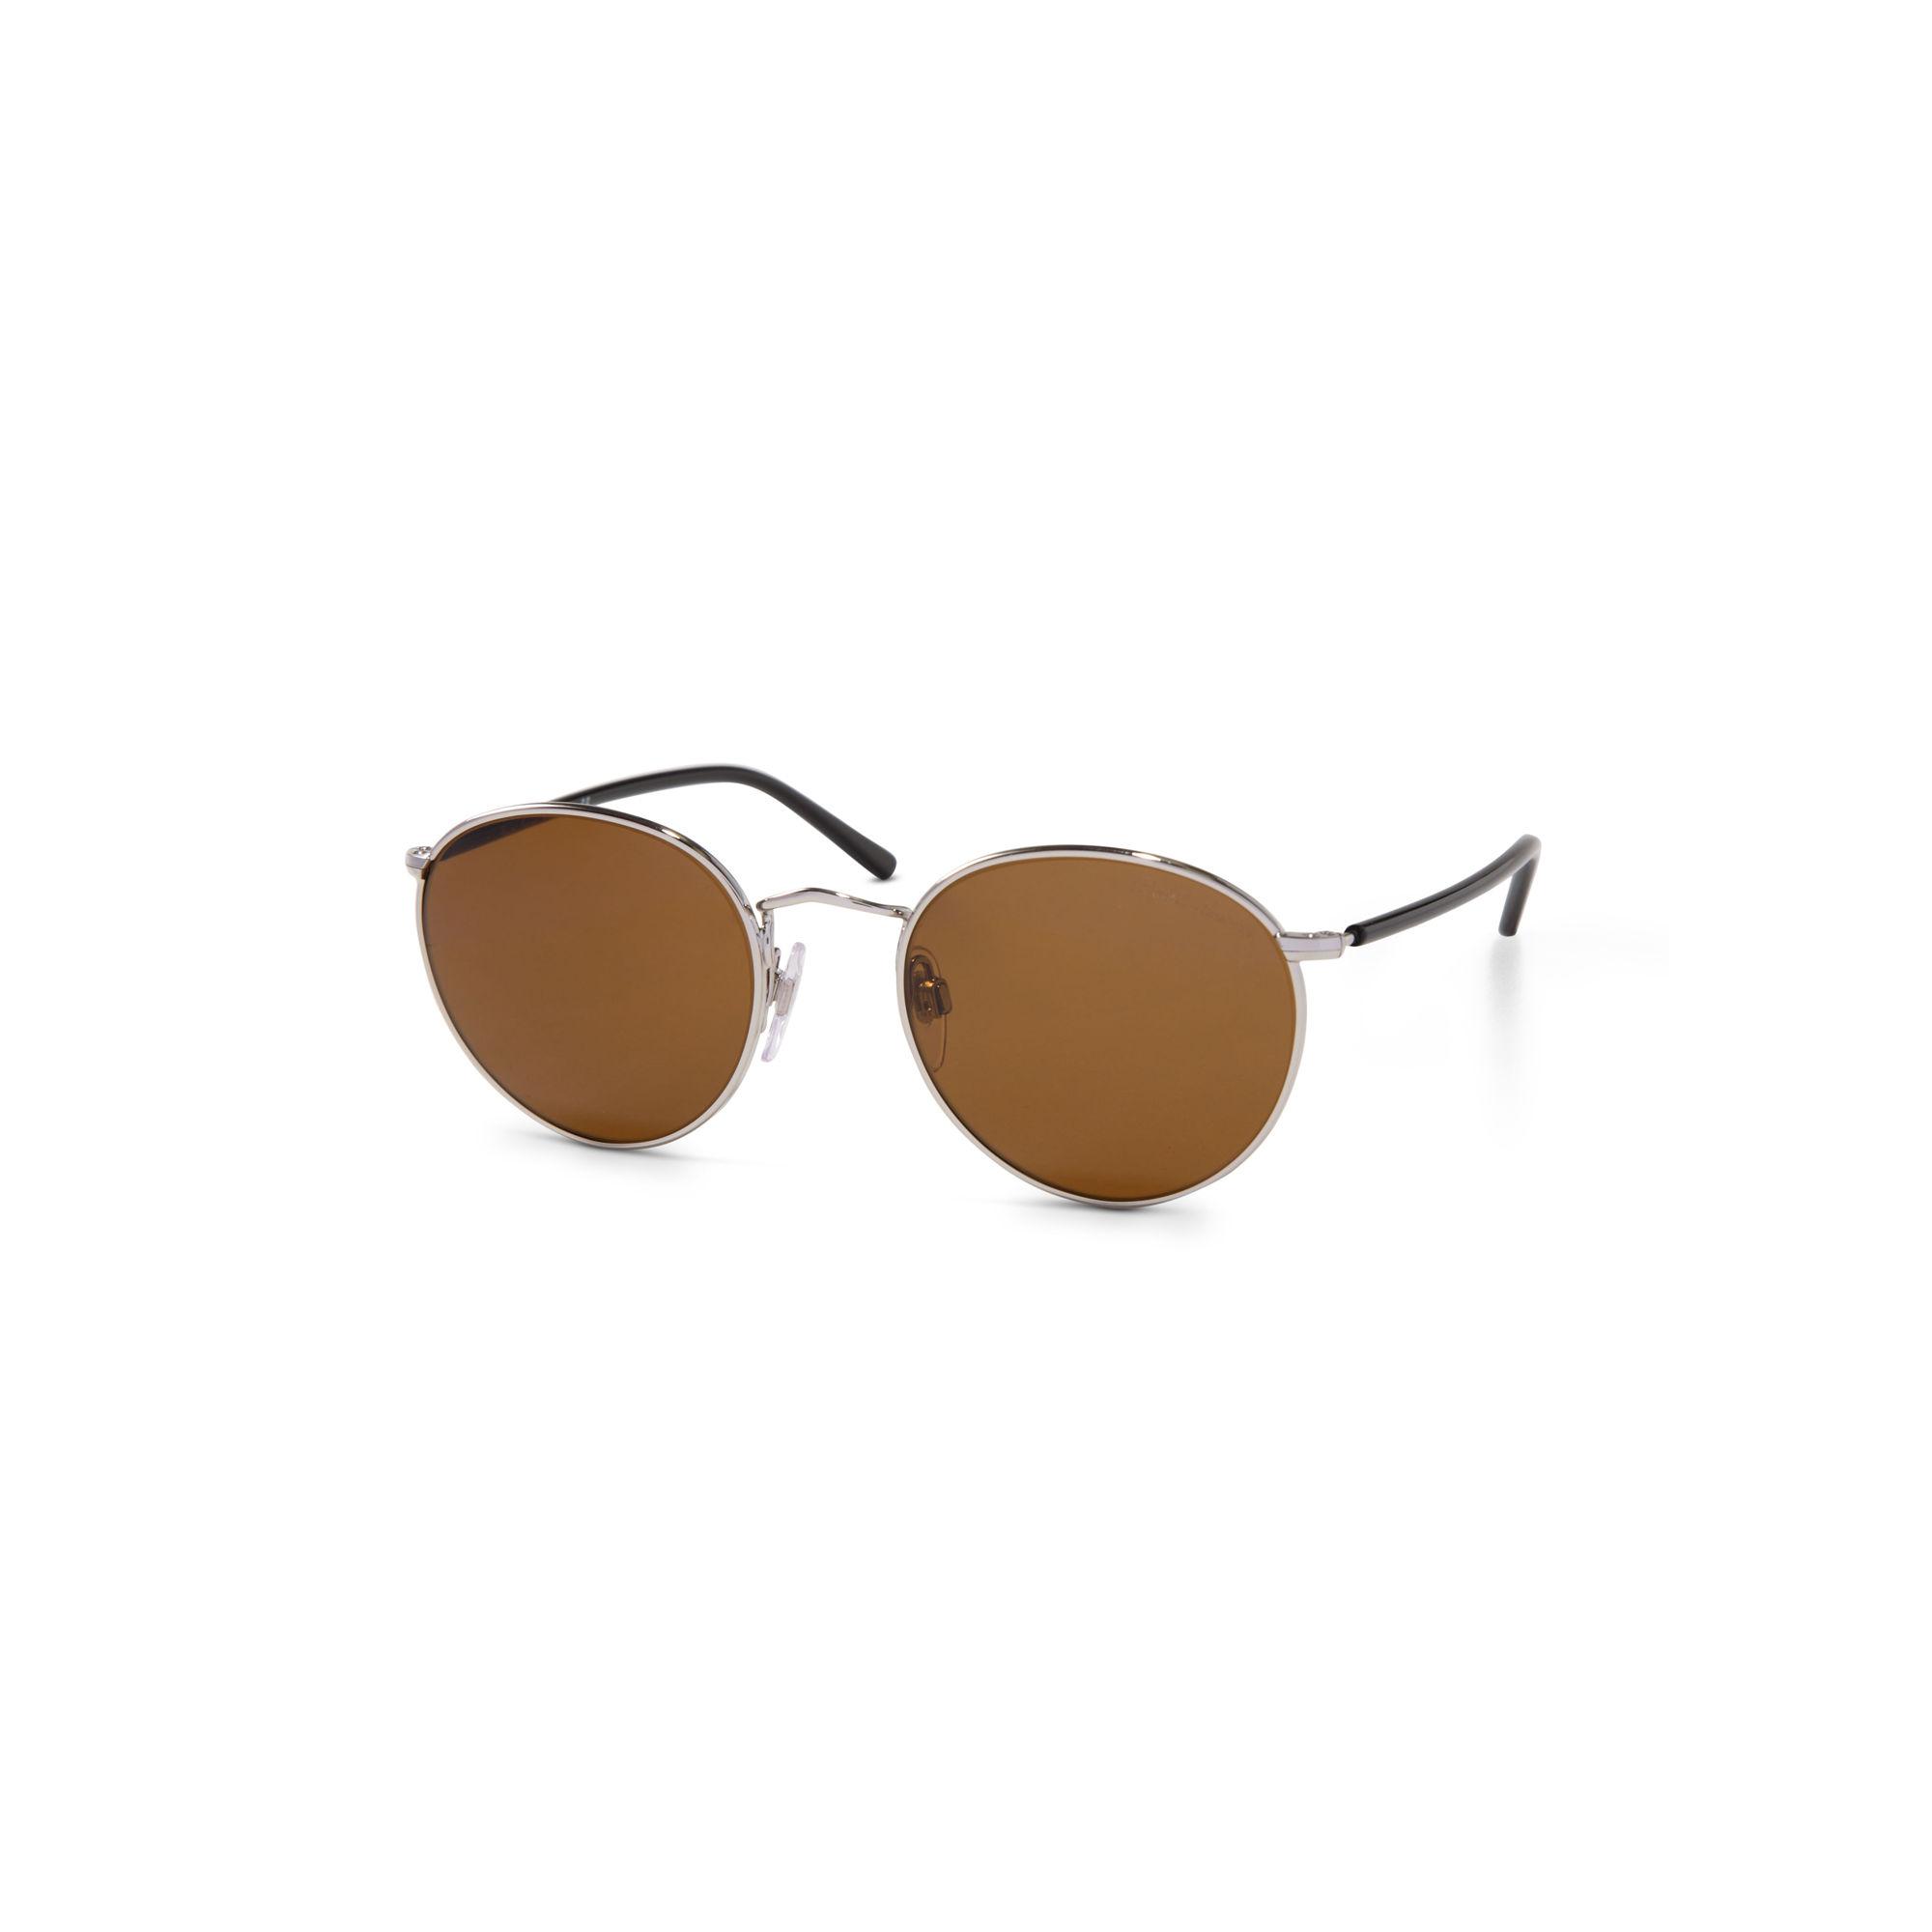 17085d1e8 ... clearance polo ralph lauren retro round sunglasses in metallic for men  lyst 381a4 d31bd ...